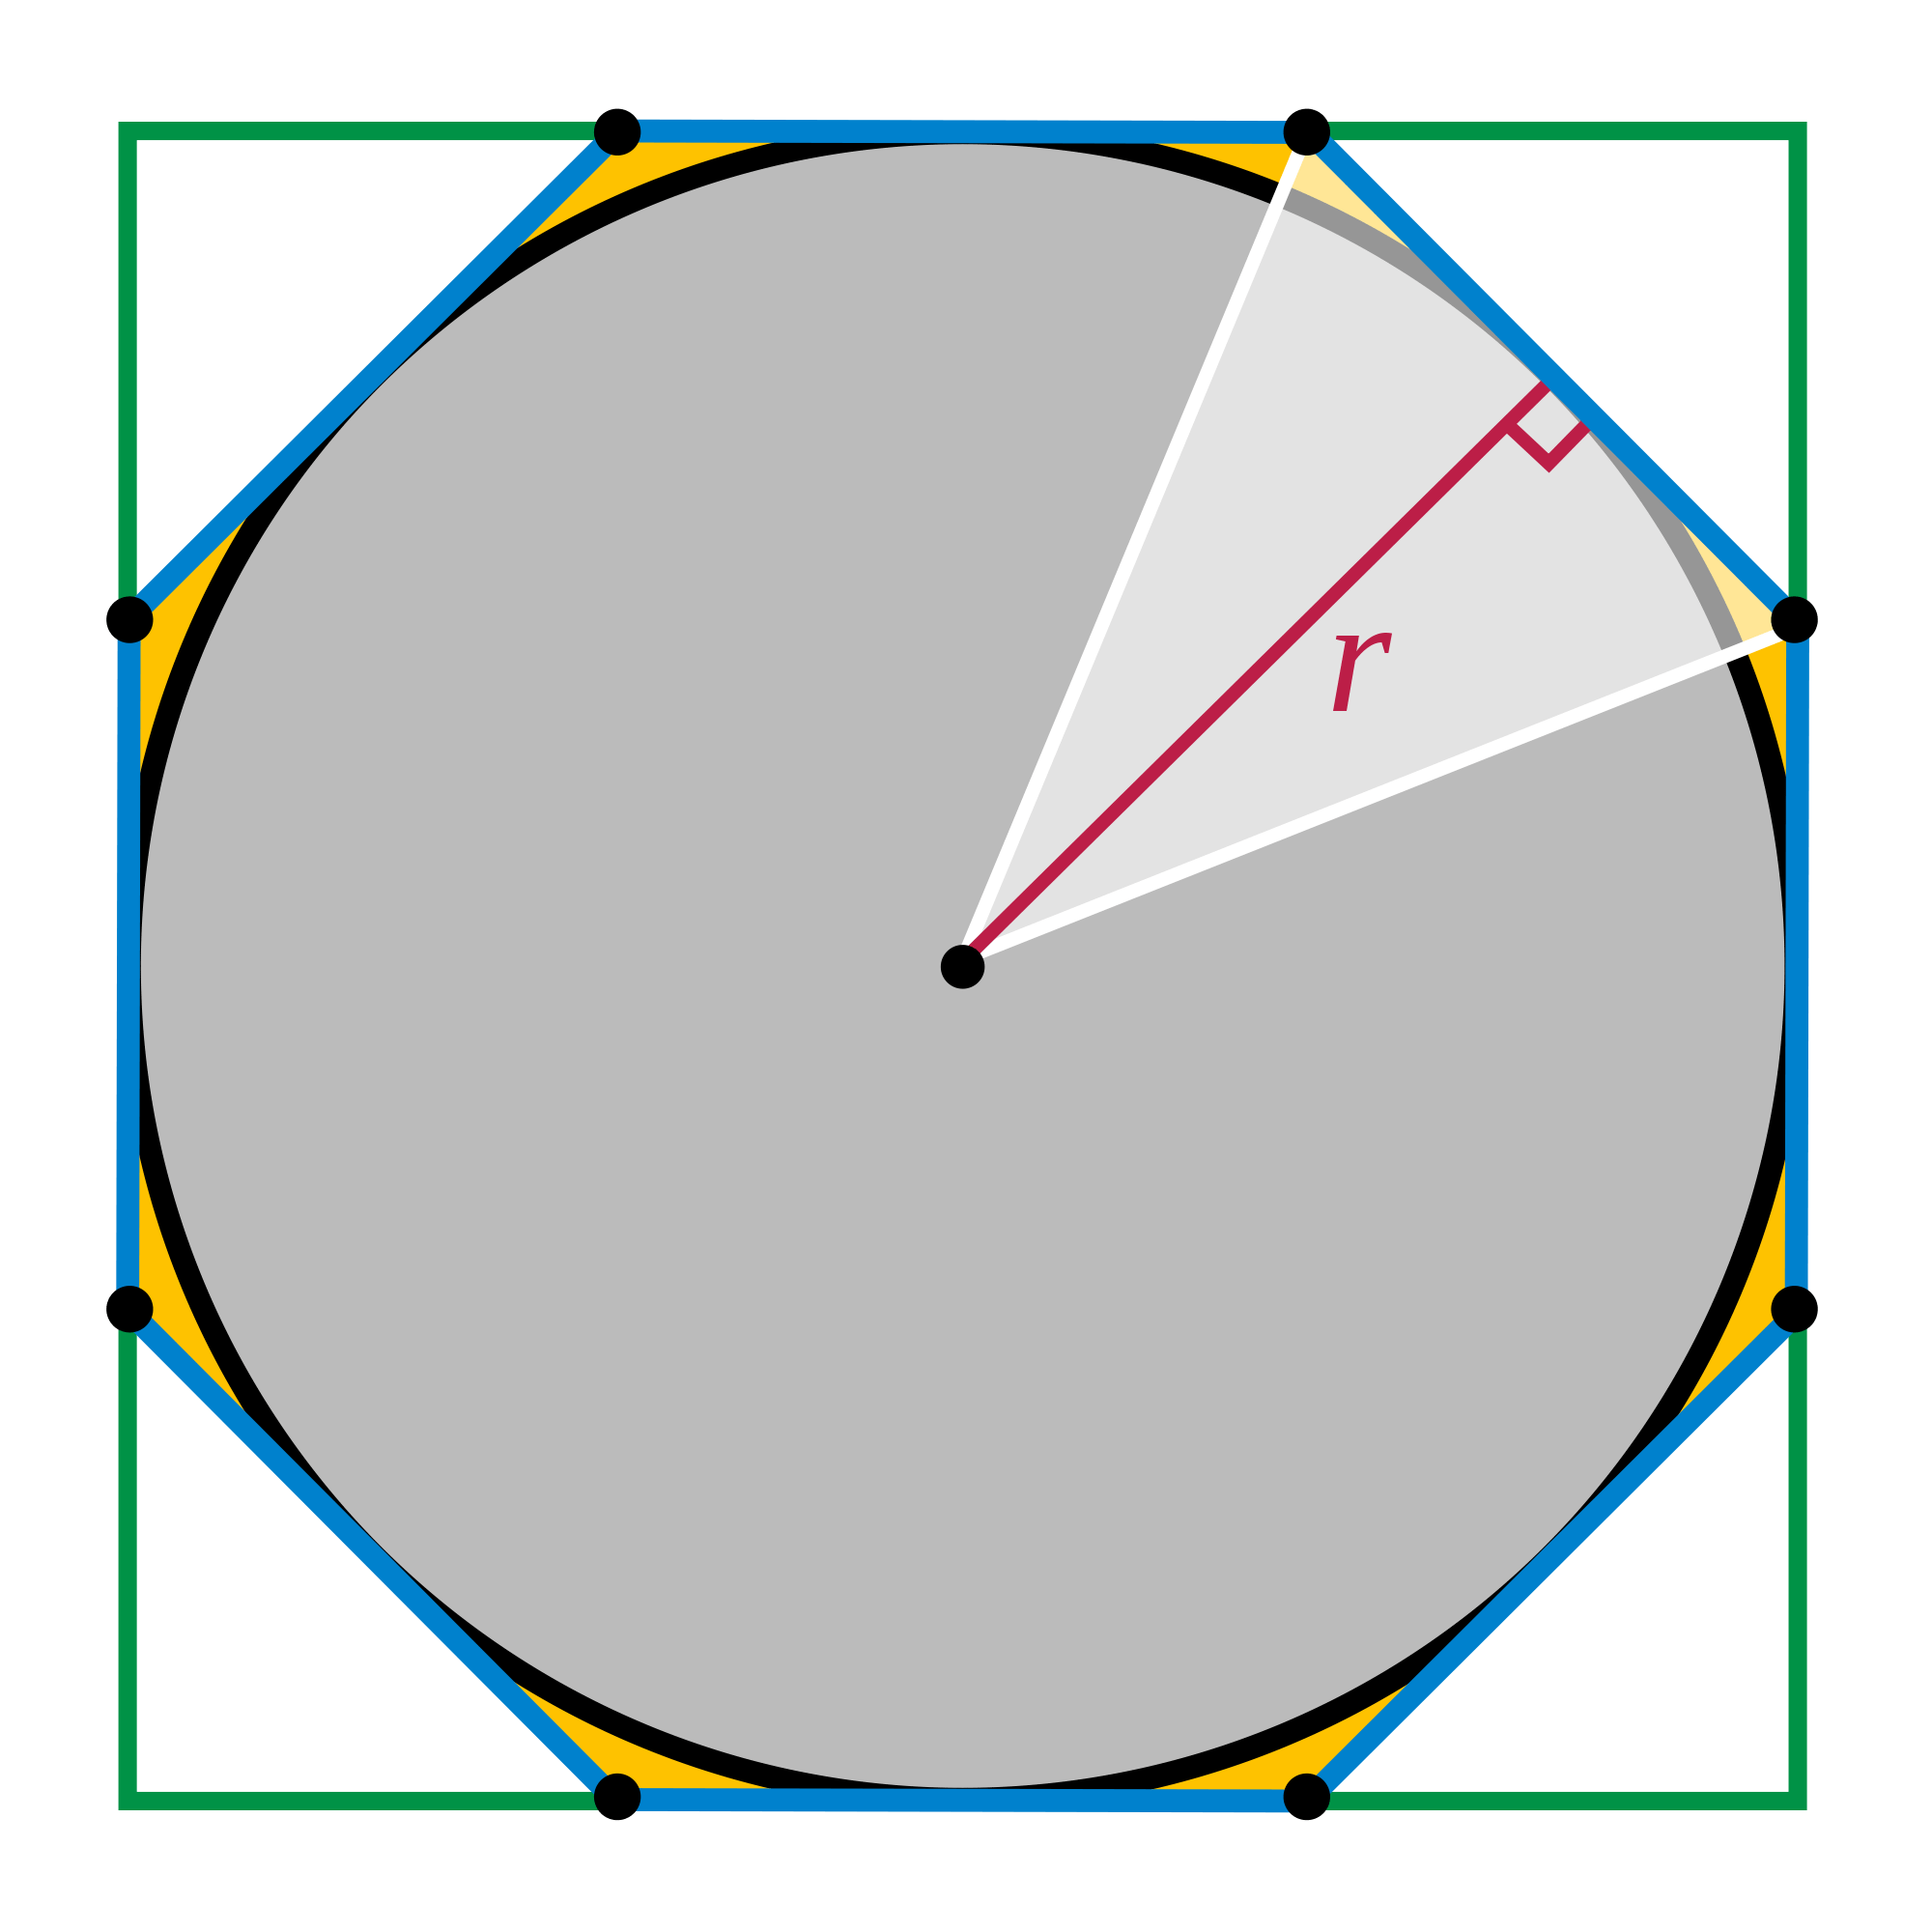 Geometry Clipart Circumference Geometry Circumference